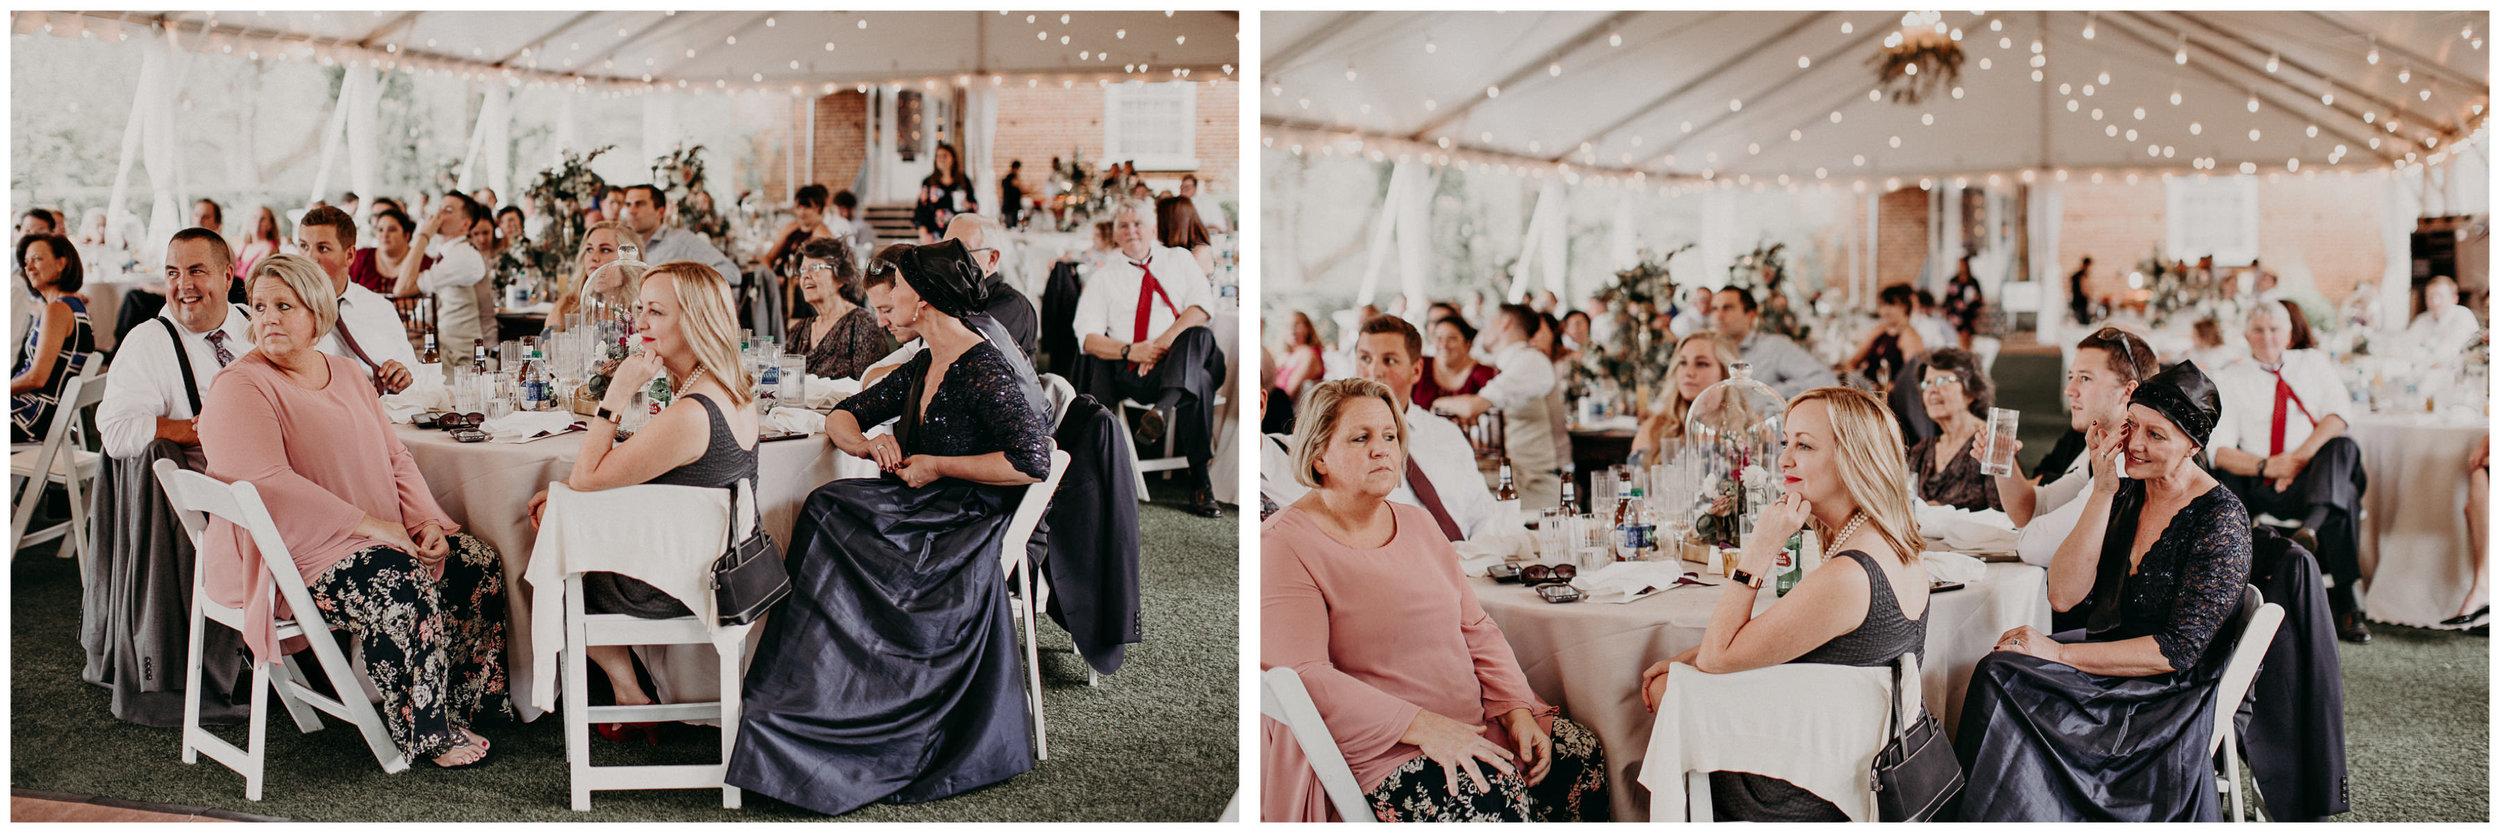 121 - Barnsley Gardens Wedding -Bride and groom portraits - Atlanta wedding photographer .jpg